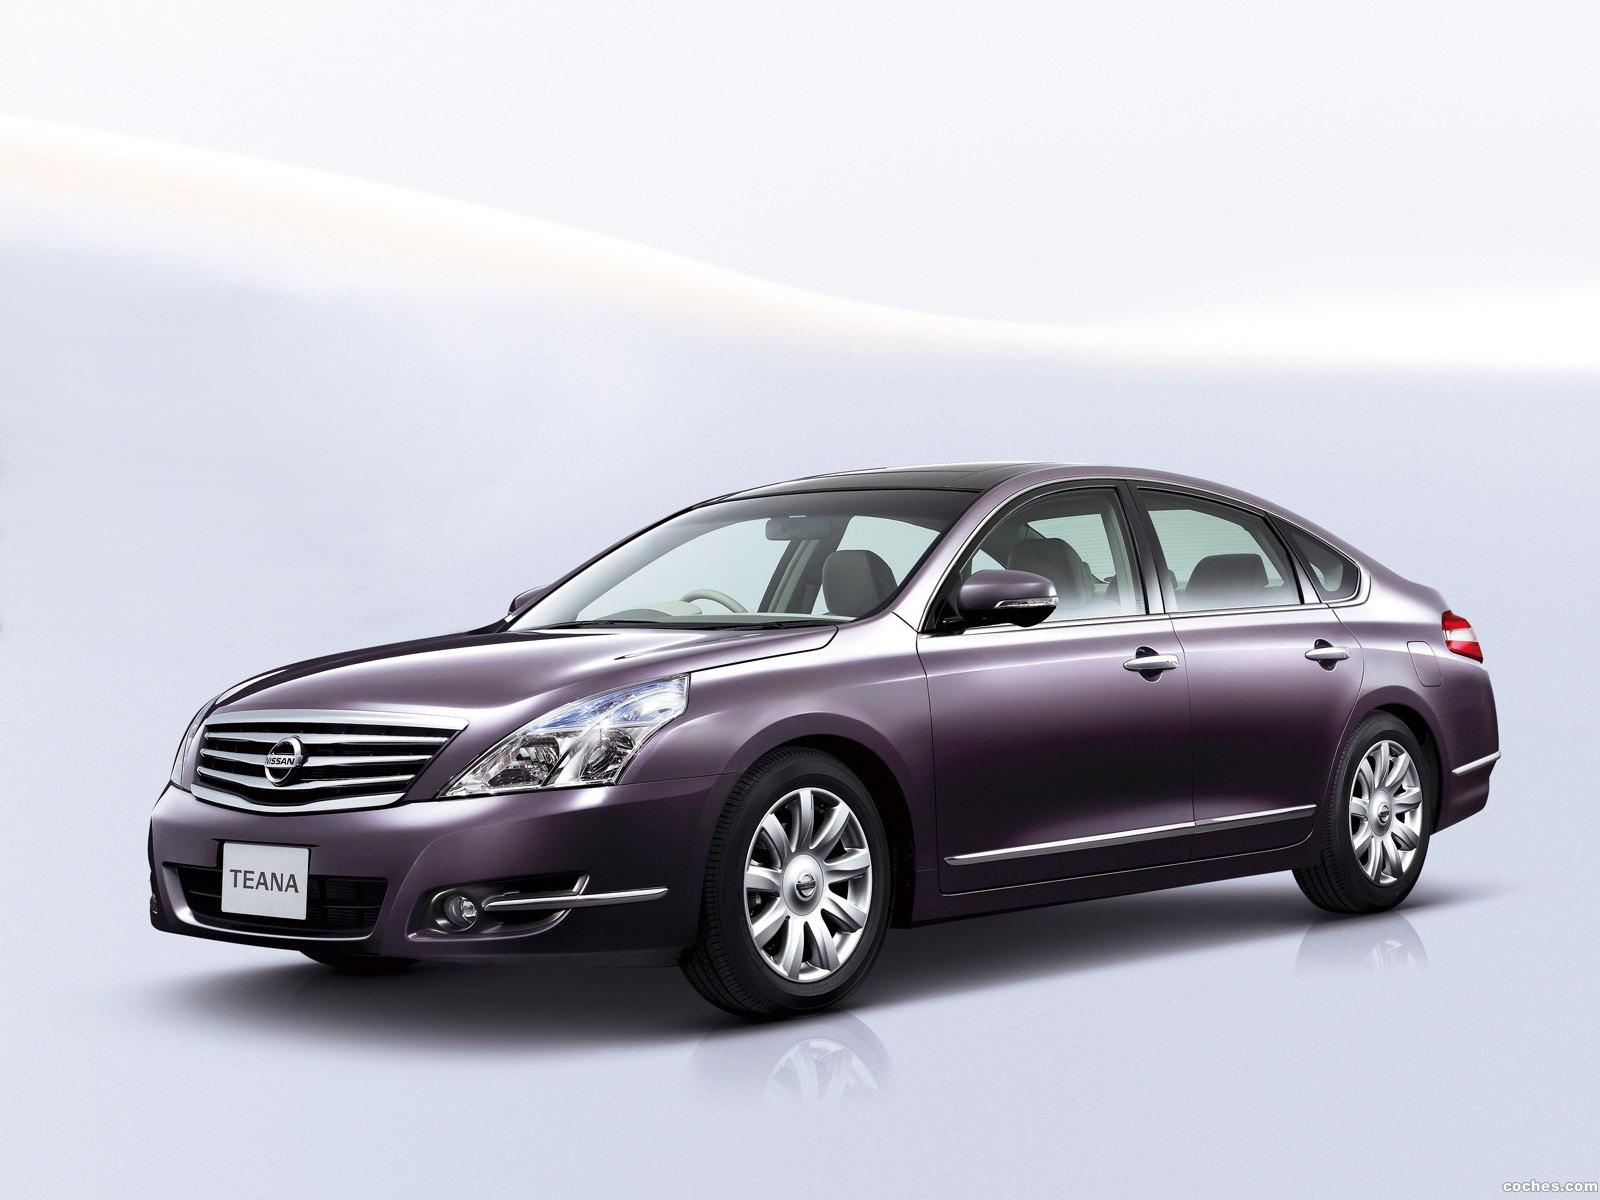 Foto 24 de Nissan Teana 2008